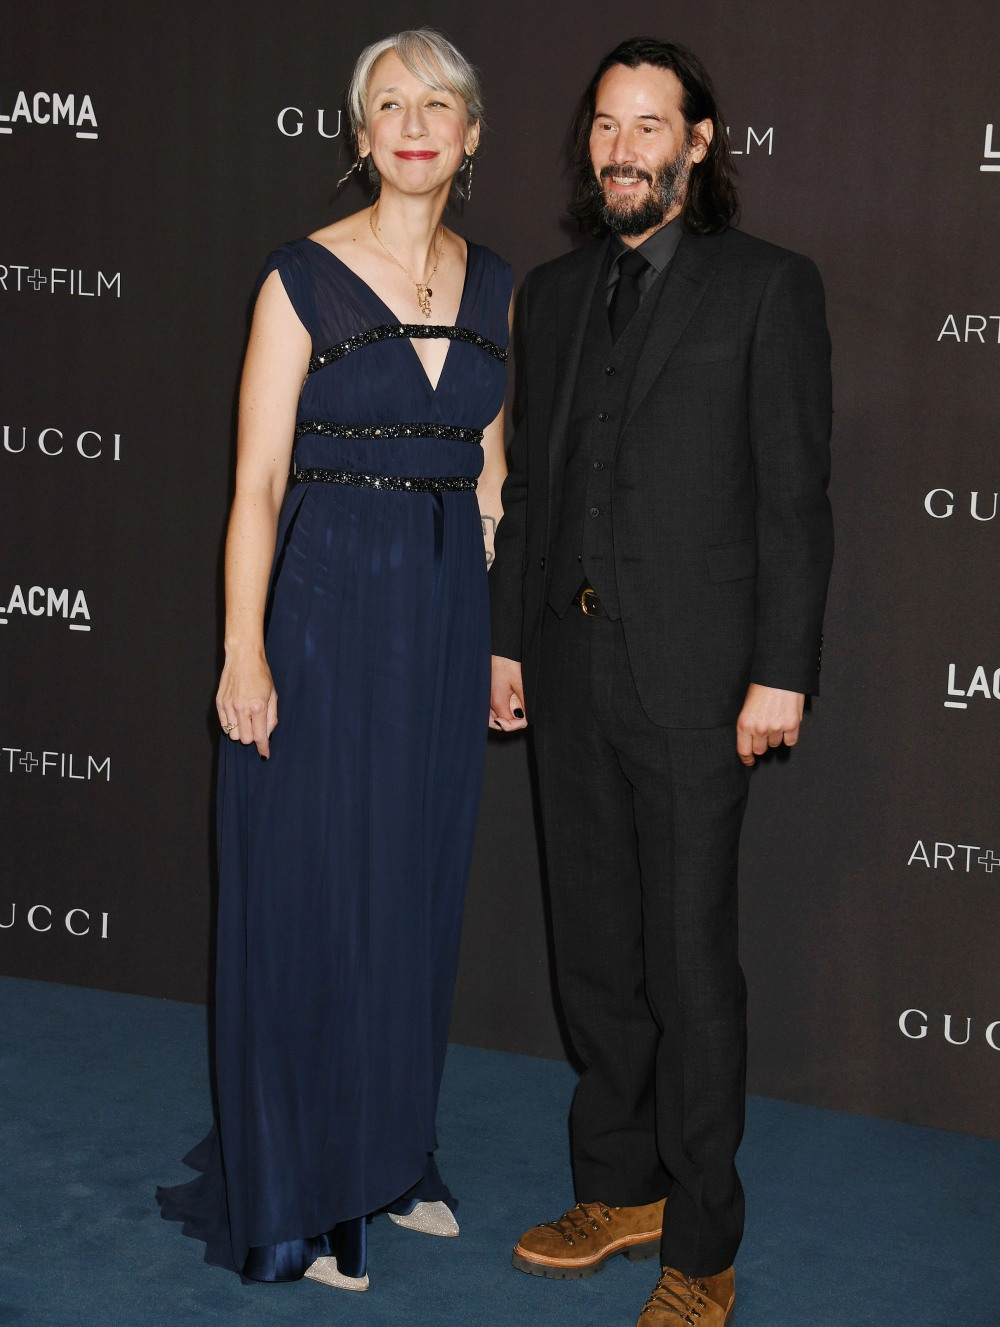 Alexandra Grant, Keanu Reeves at the 2019 LACMA Art + Film Gala at LACMA